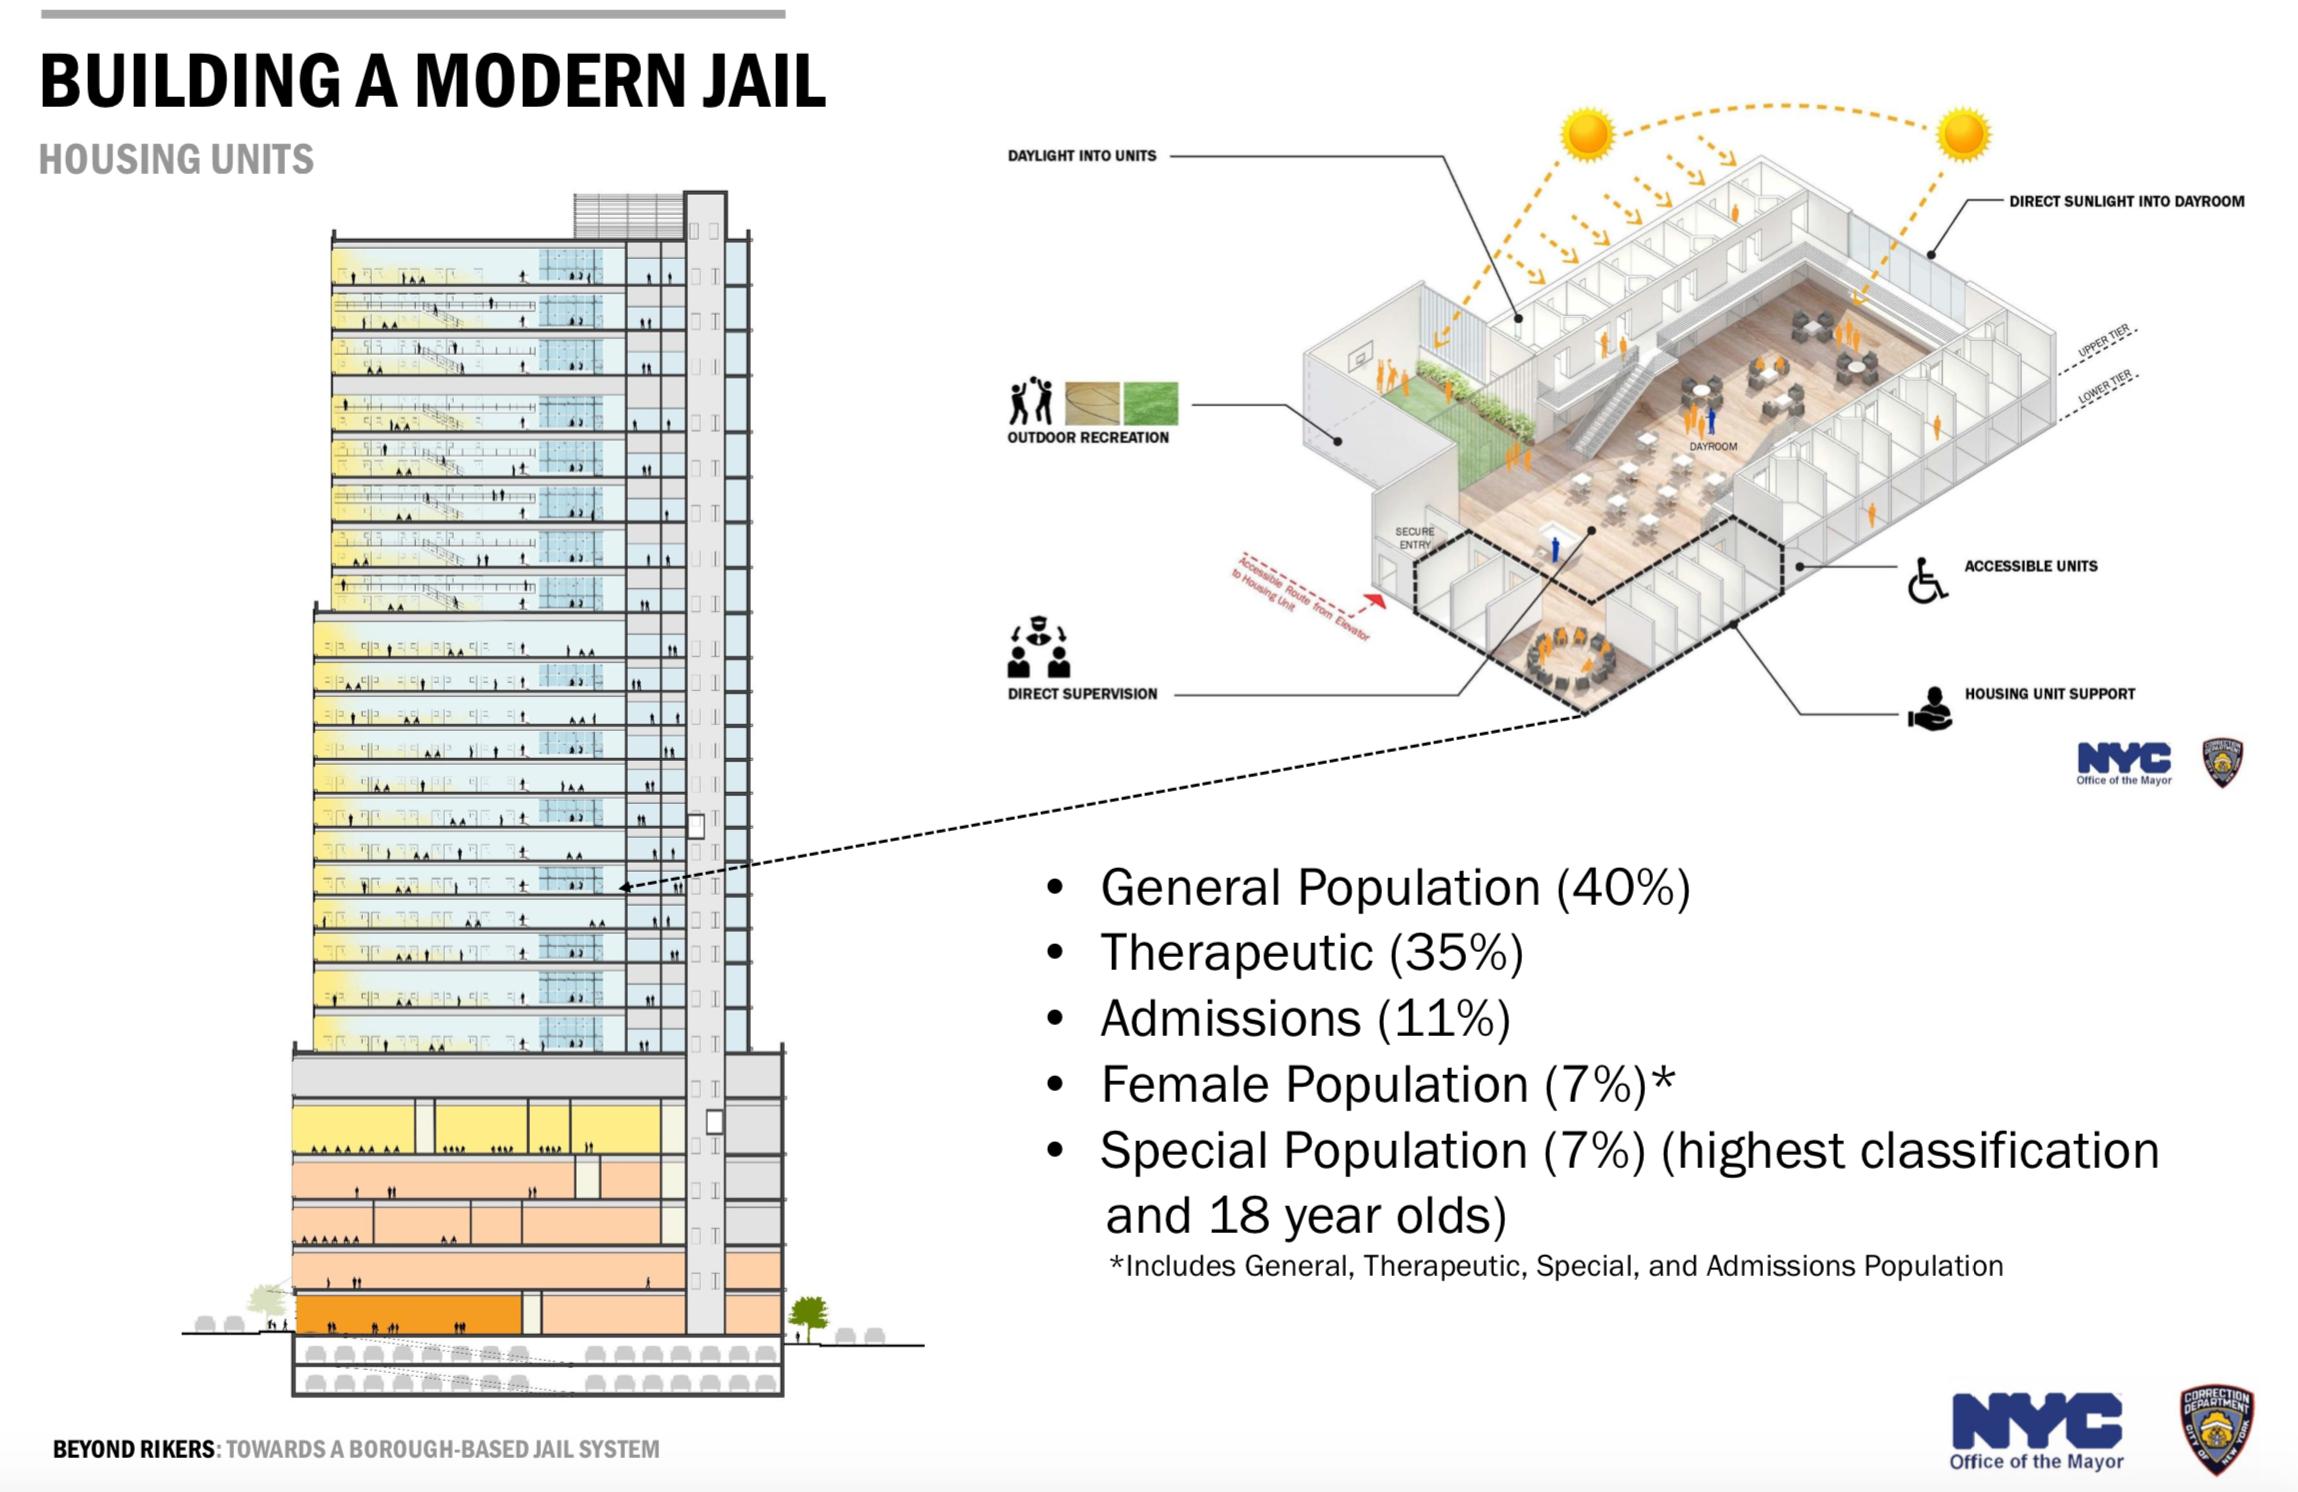 City mulls ways to shrink Rikers-replacing Manhattan jail